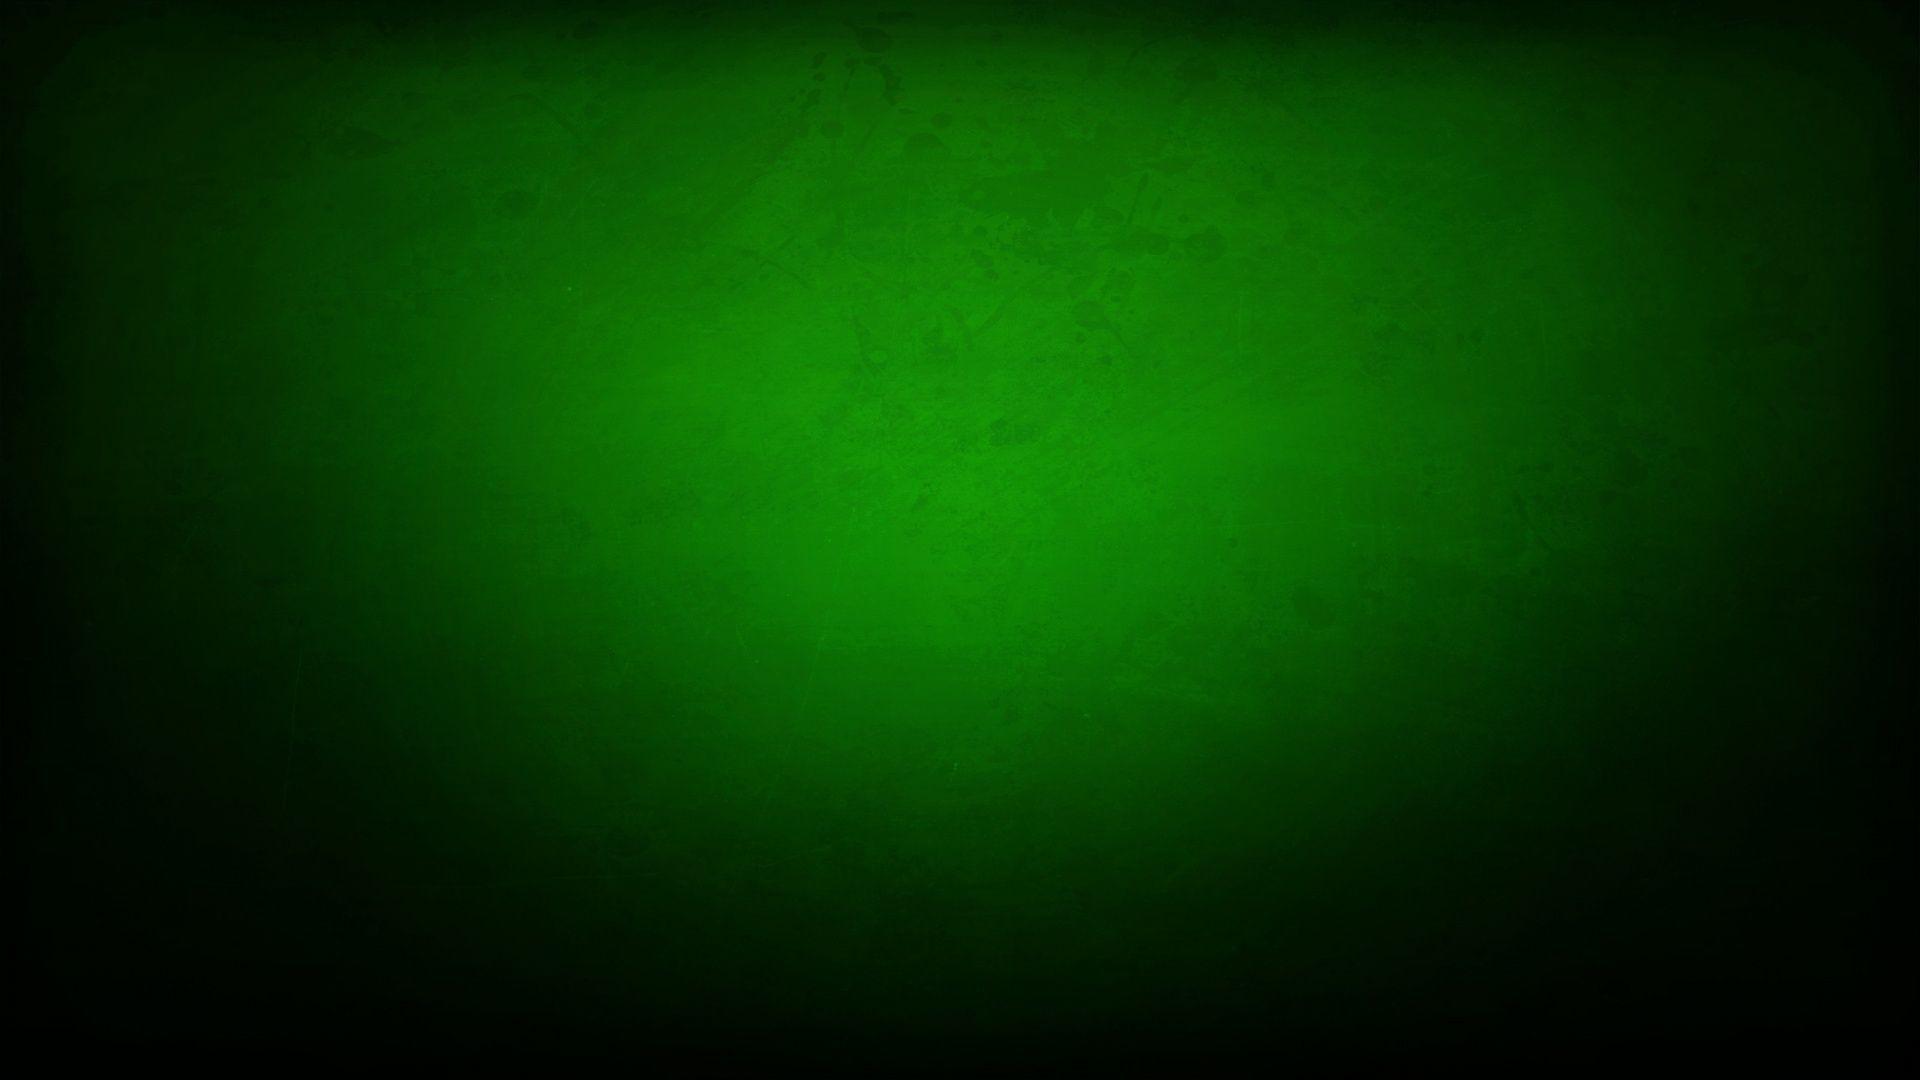 Green Backgrounds Image Wallpaper 1920×1080 Green Backgrounds (36 Wallpapers)  | Adorable Wallpapers